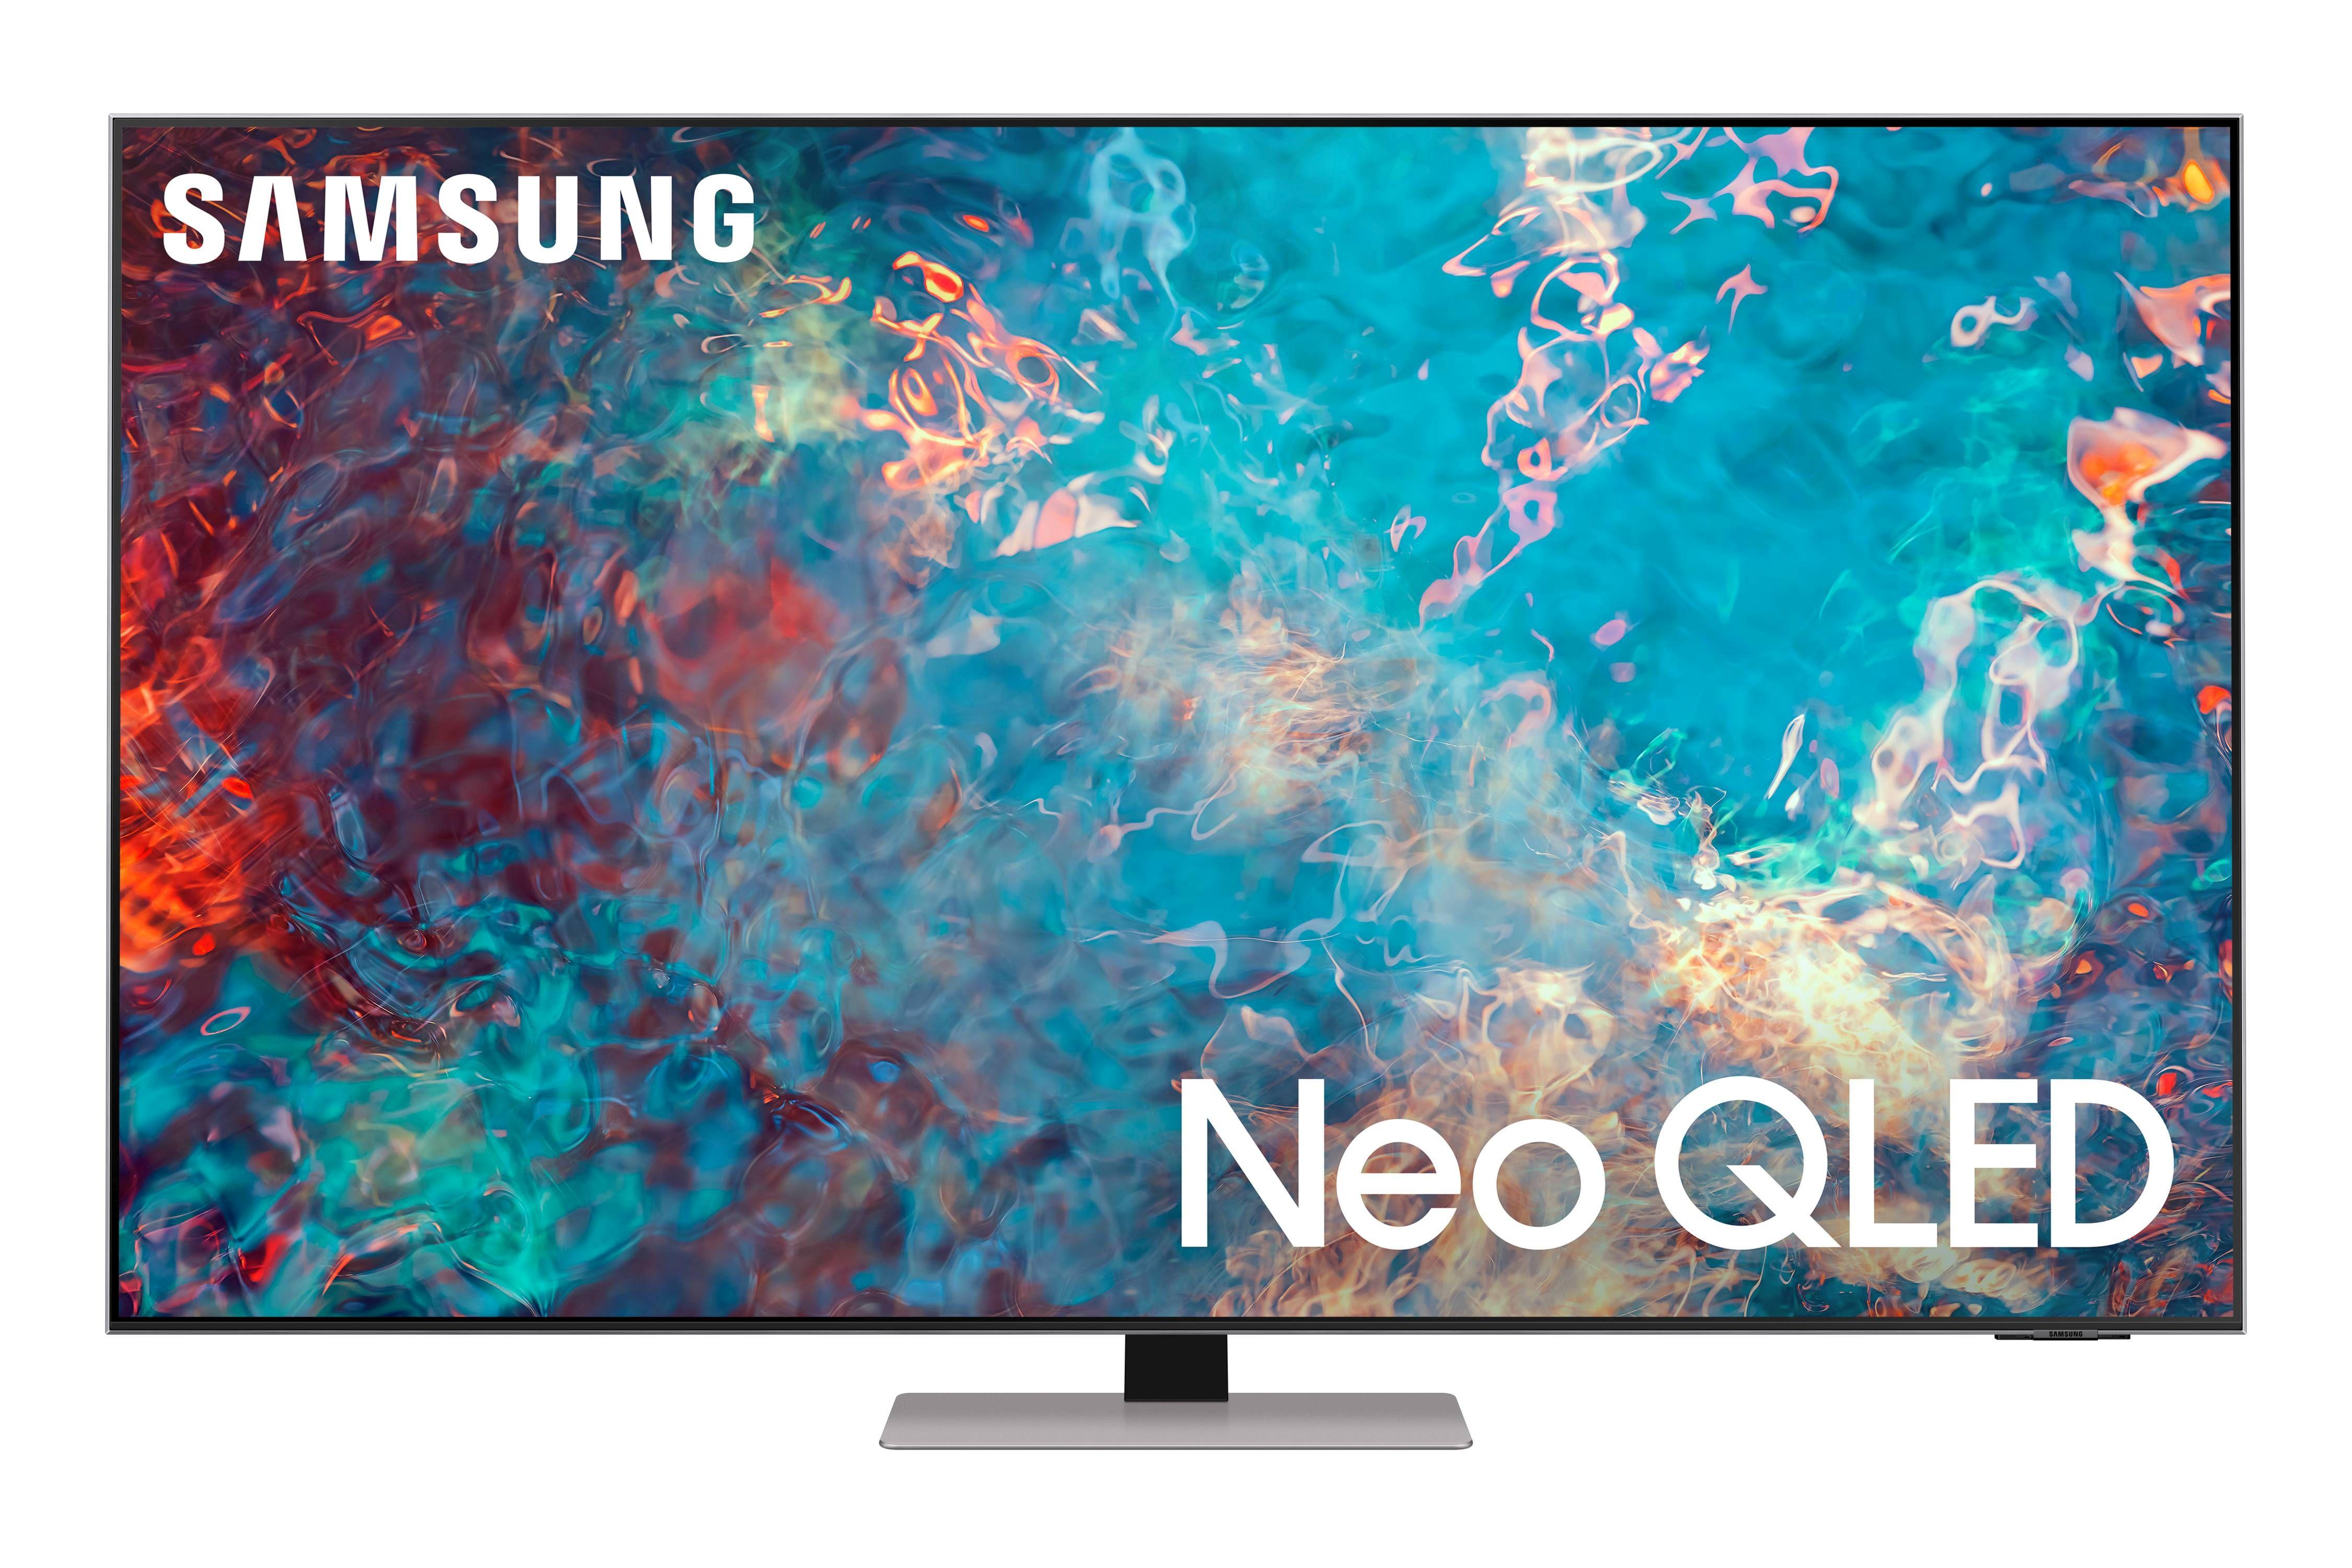 Samsung Neo QLED Promocja